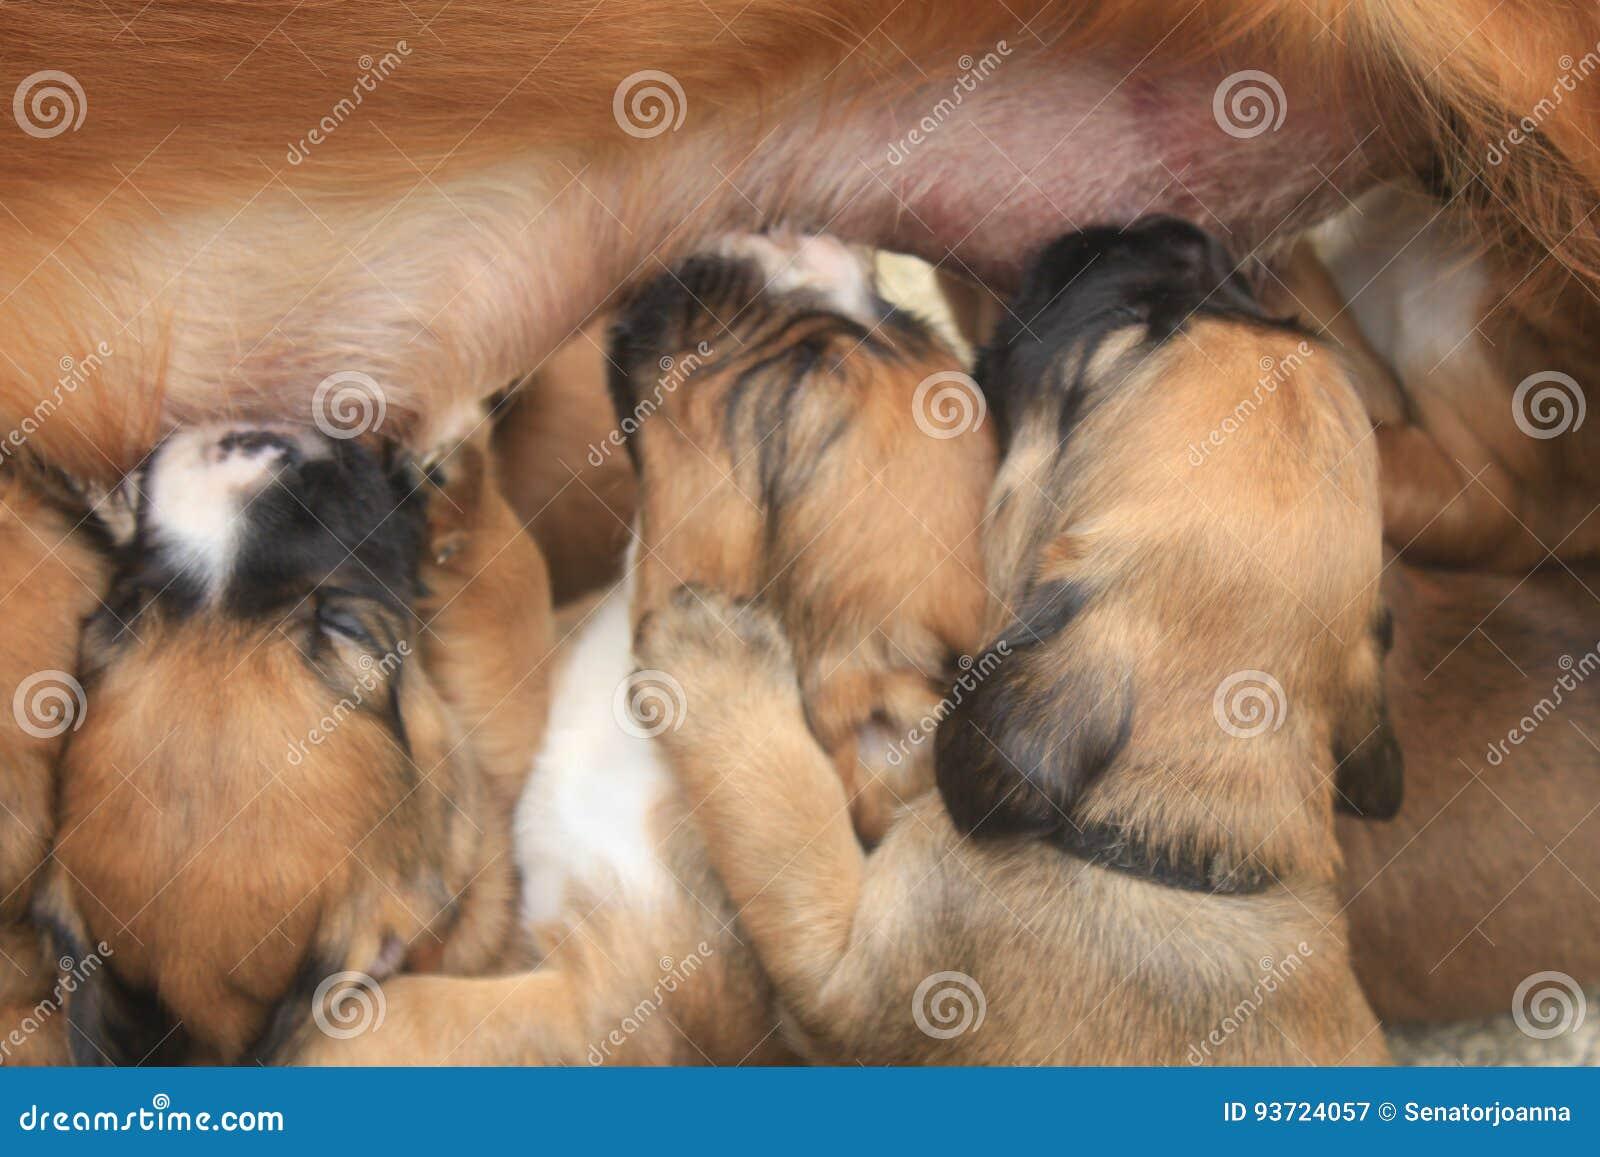 Little Puppies Nursing Stock Image Image Of Motherhood 93724057